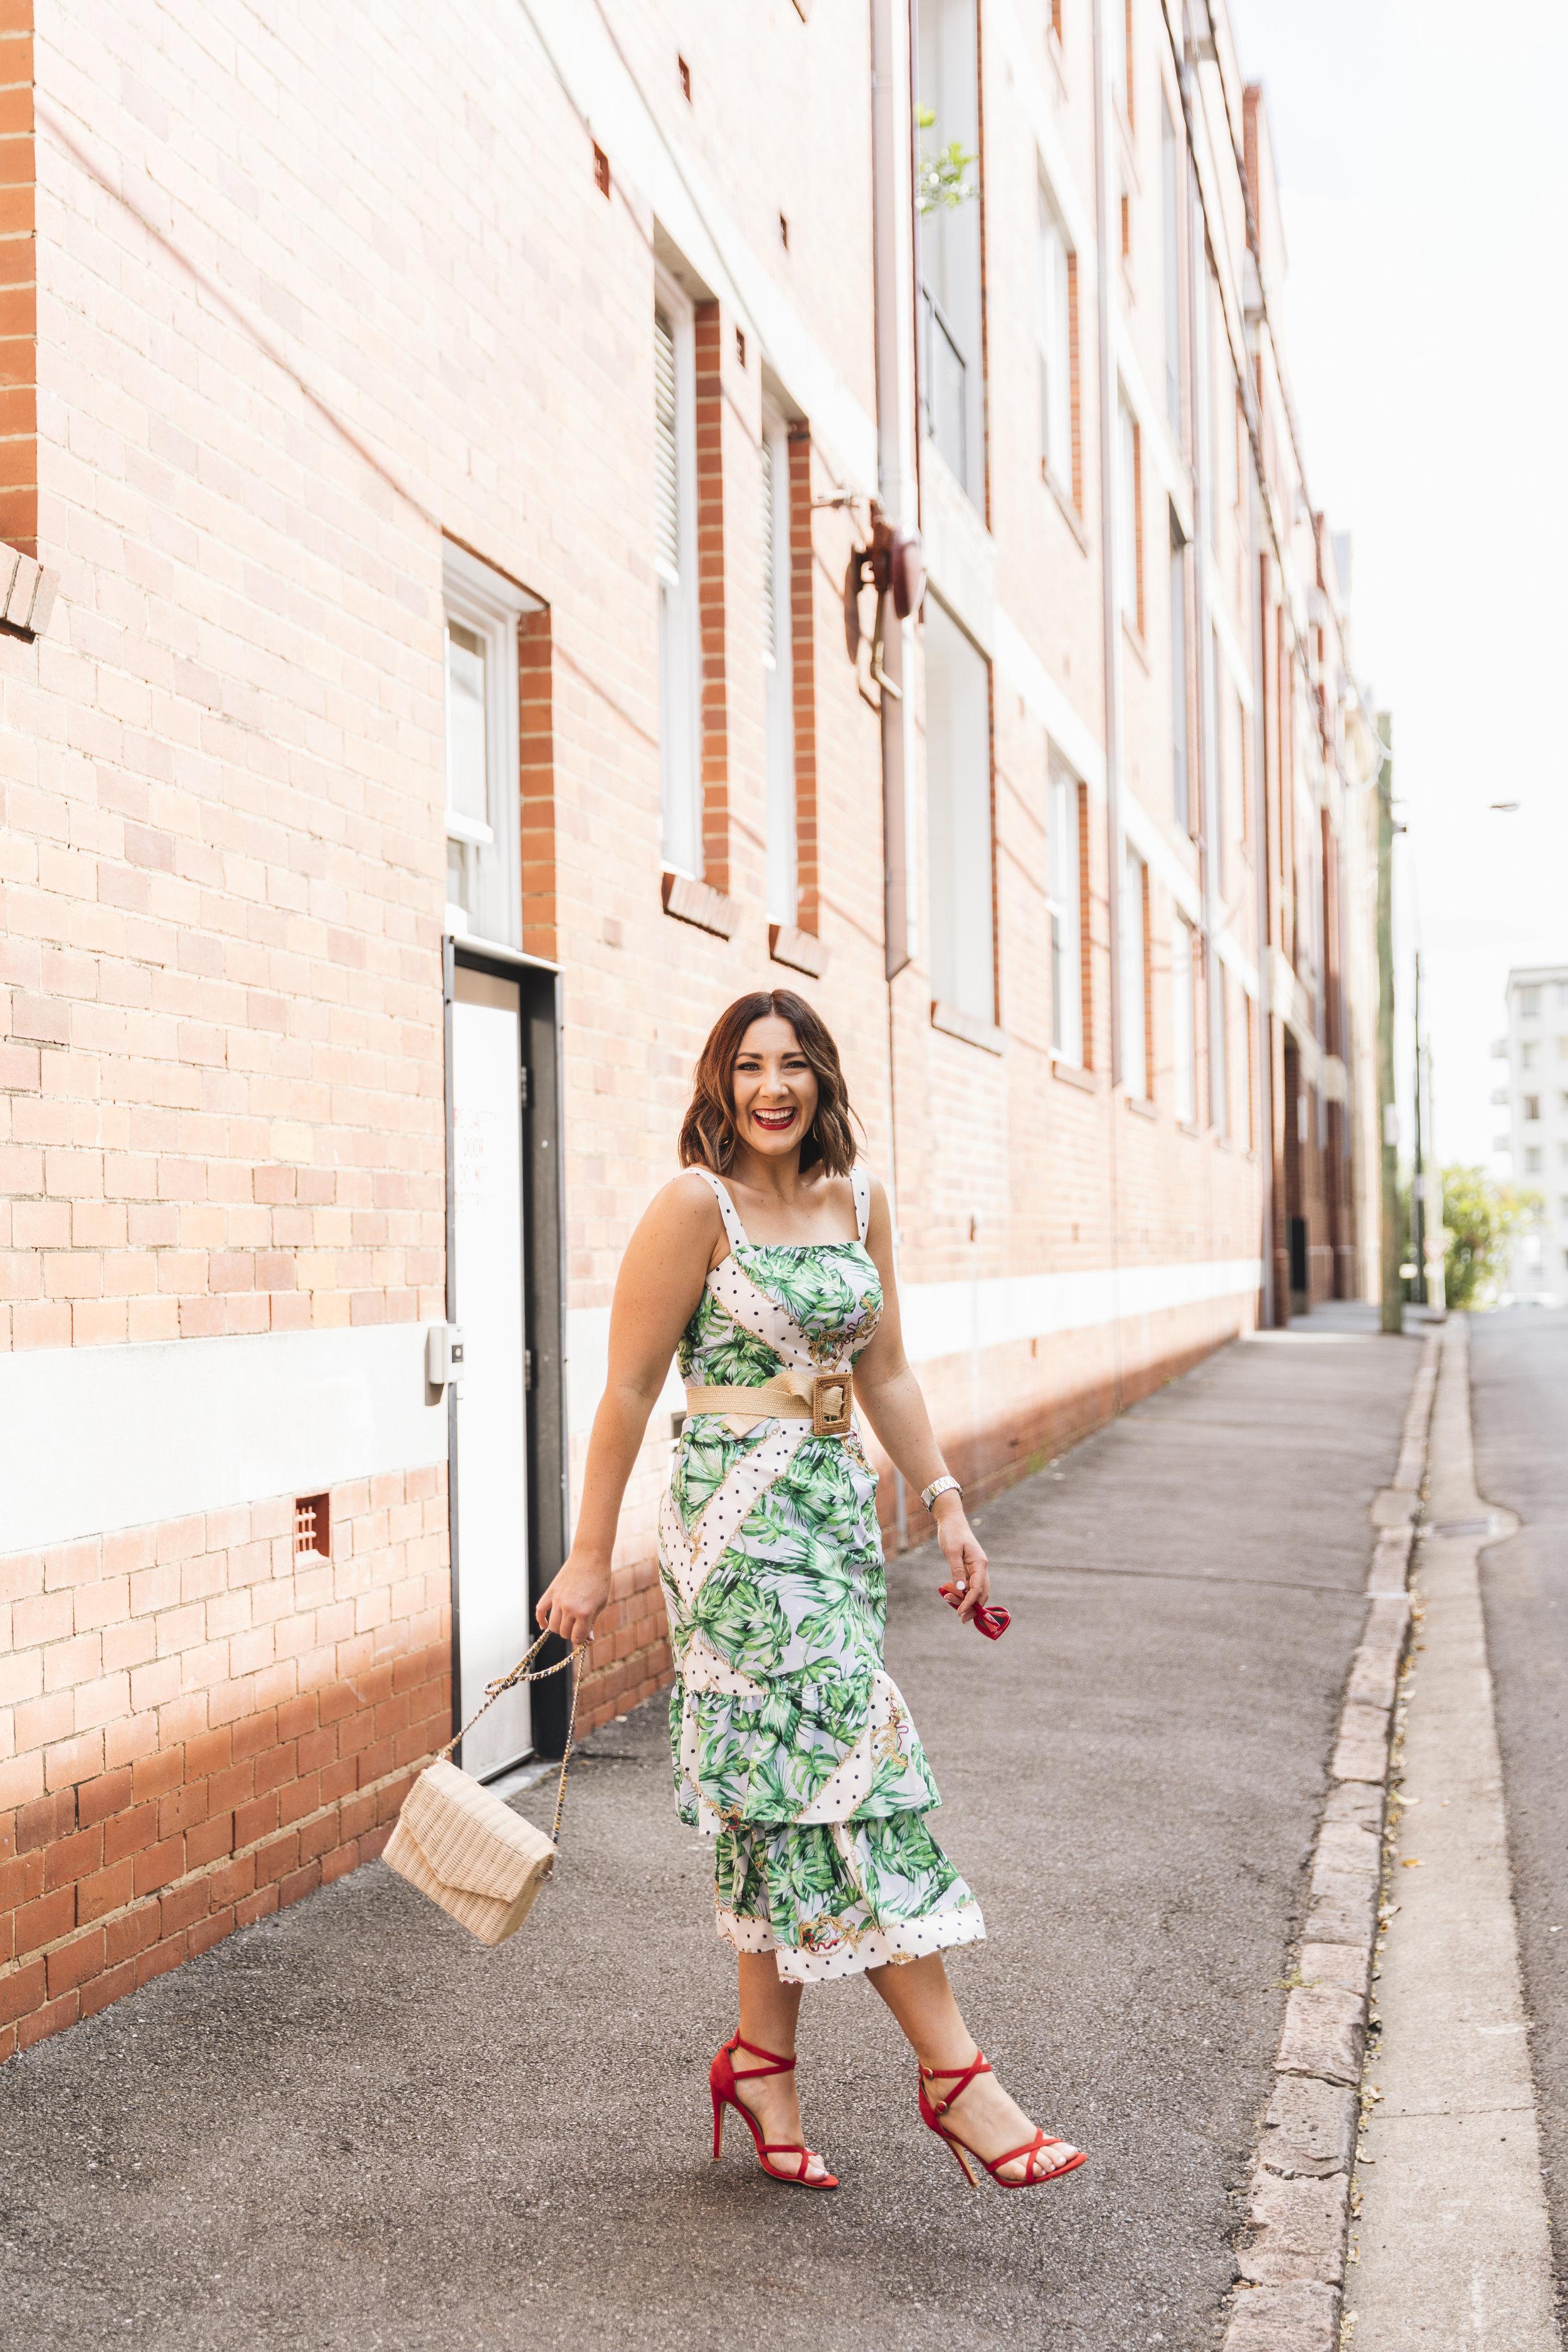 Kerrie wearing a custom Milva Carucci Designs dress.